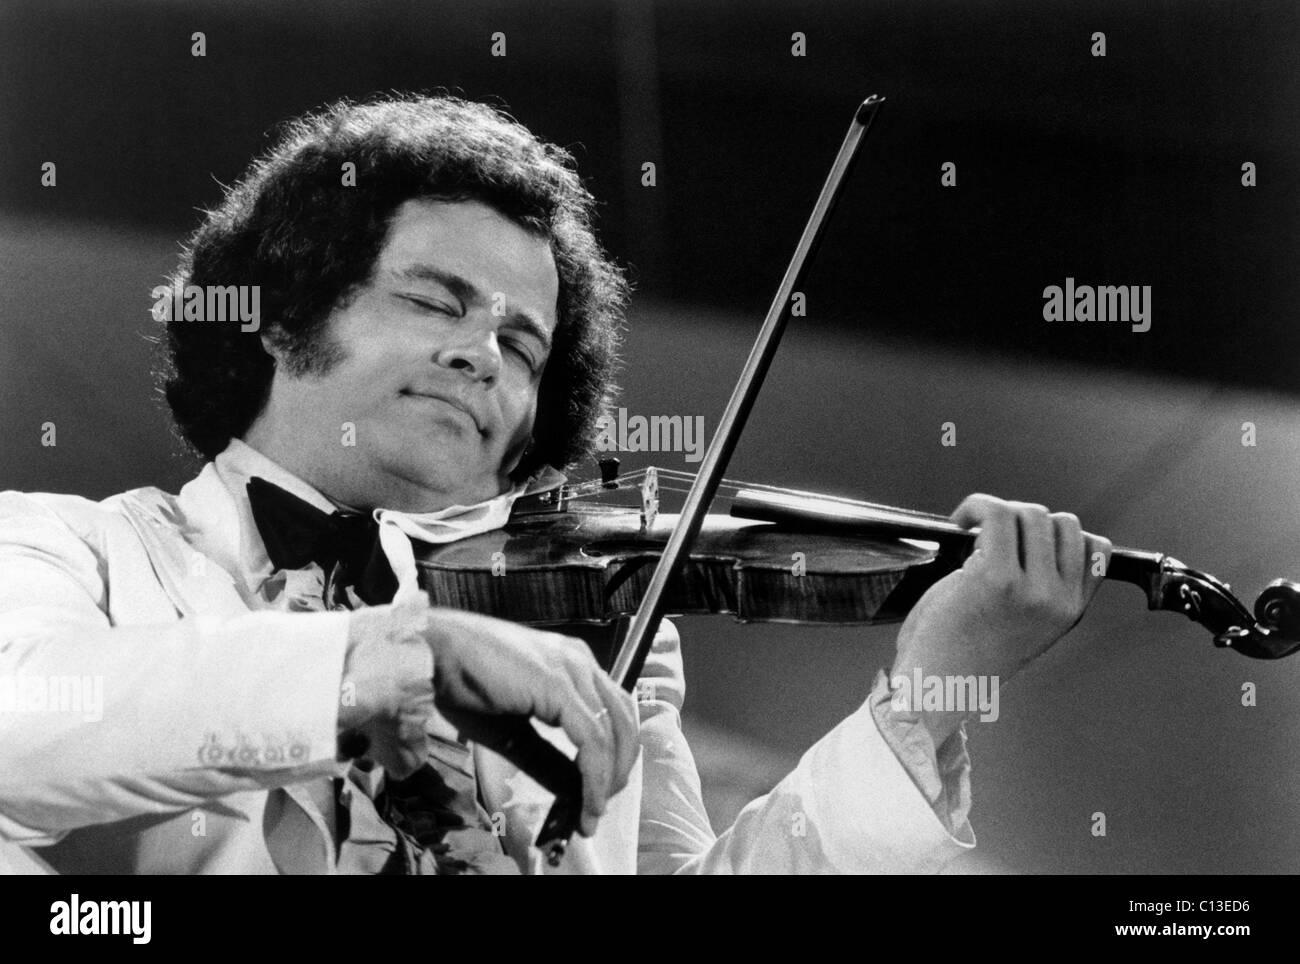 Itzhak Perlman, ca. 1970s - Stock Image